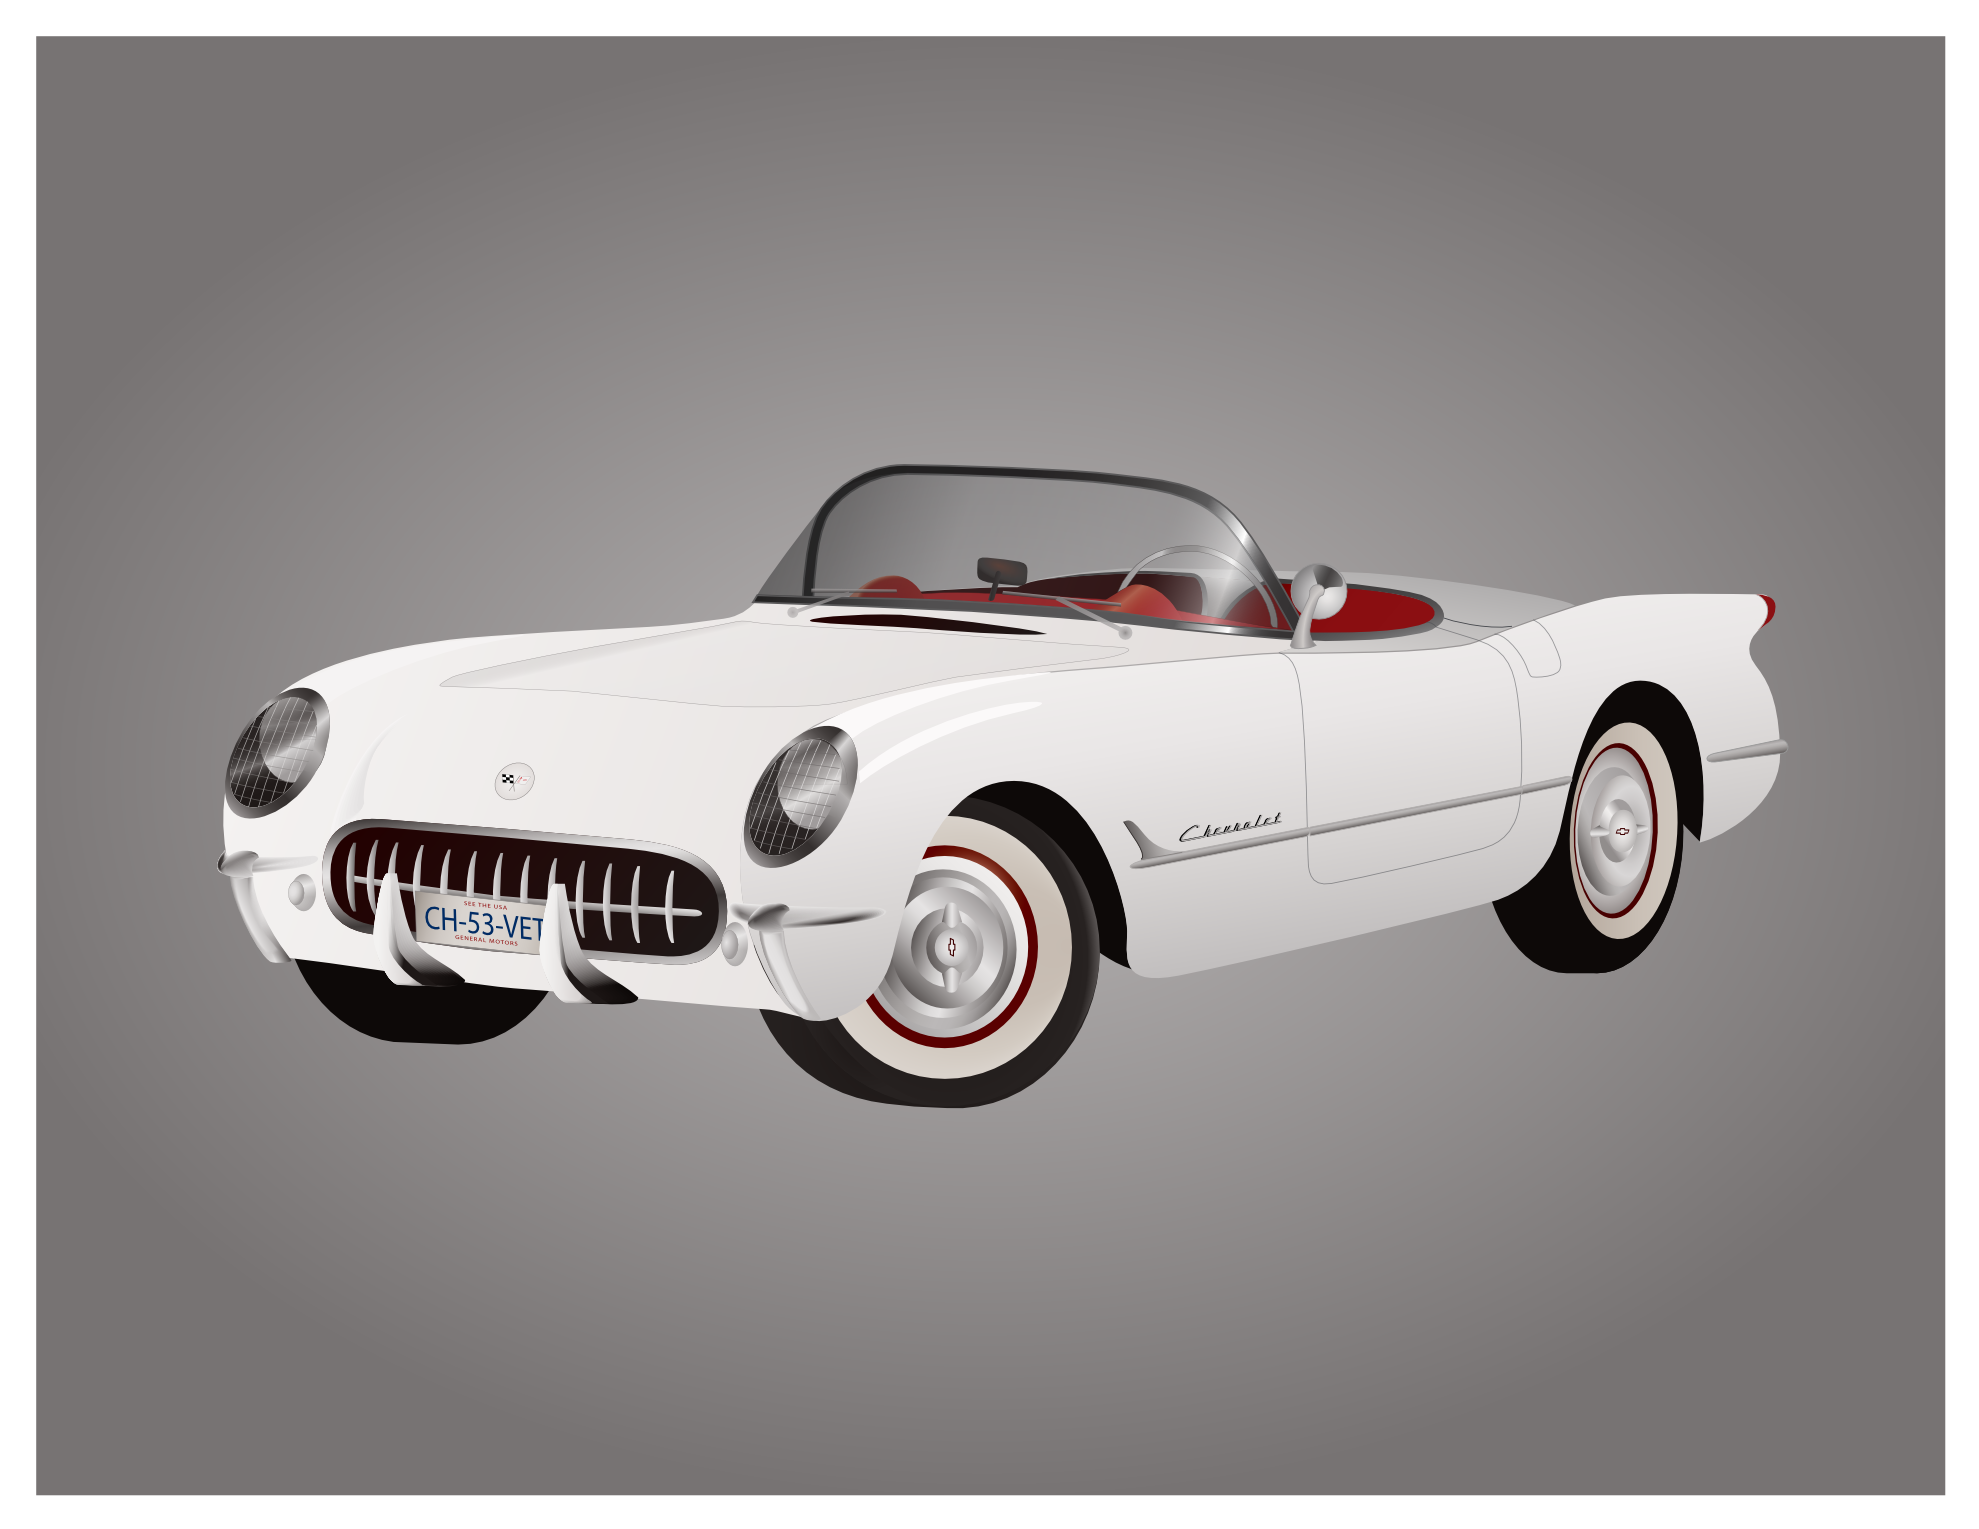 1953 Corvette Clipart.